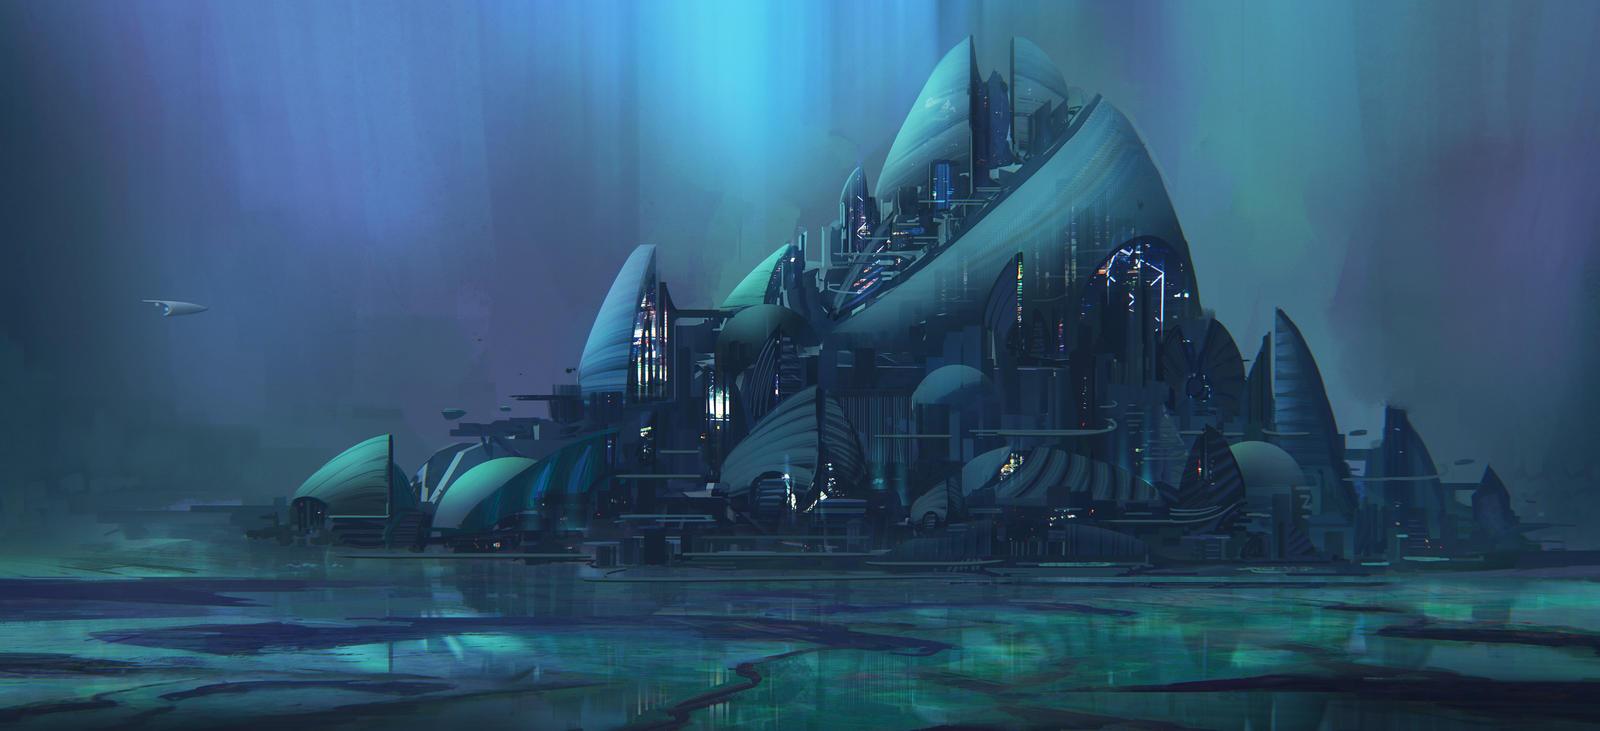 Laguna city by Tryingtofly